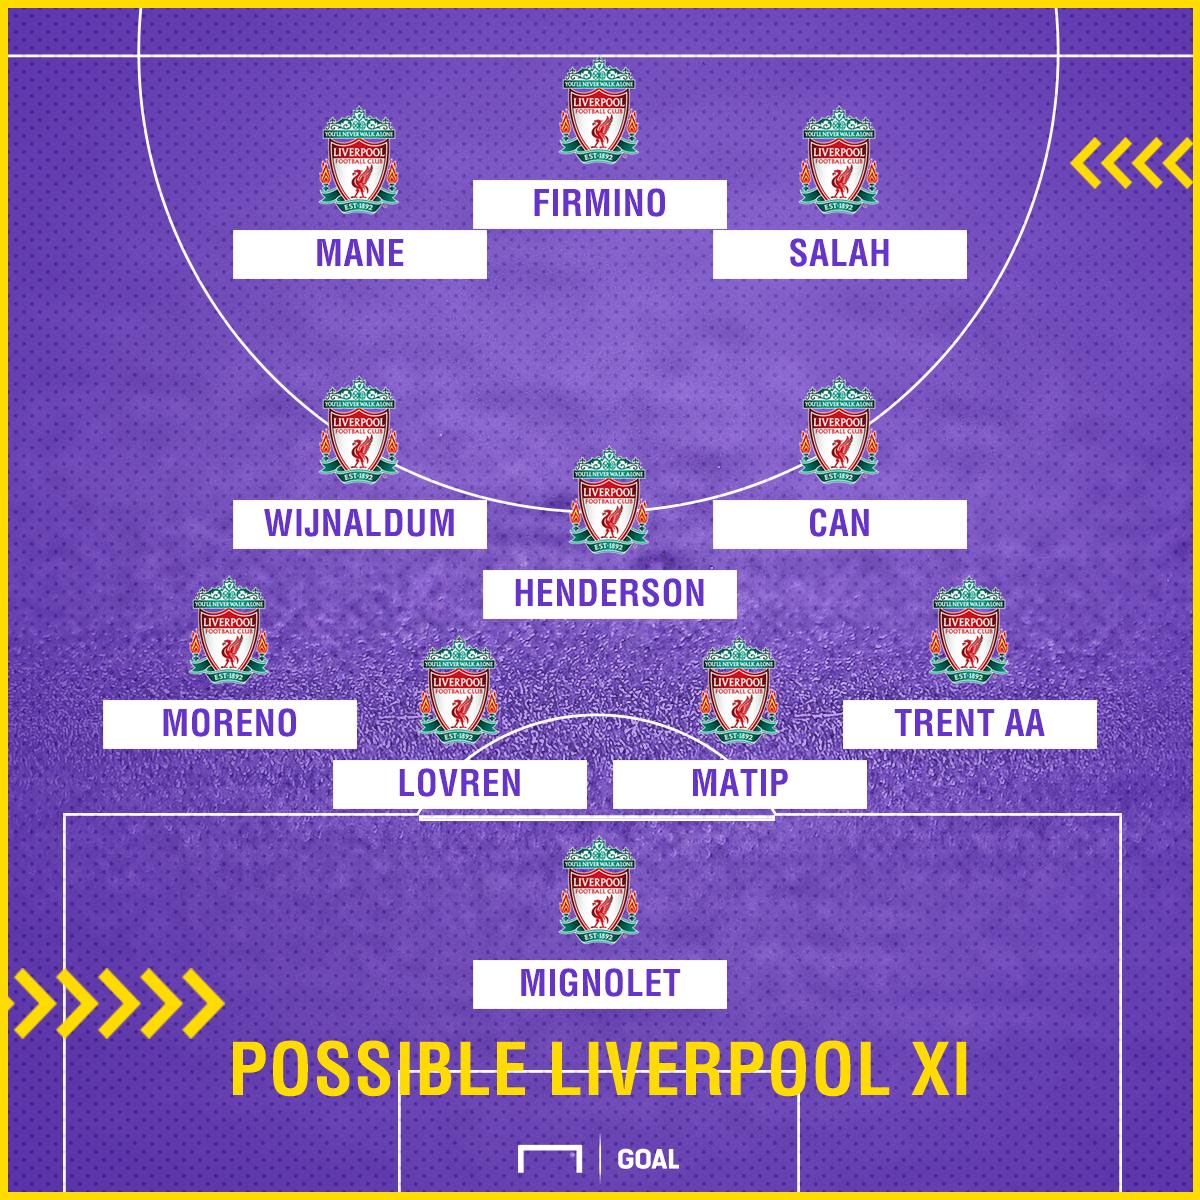 GFX Possible Liverpool XI v Arsena